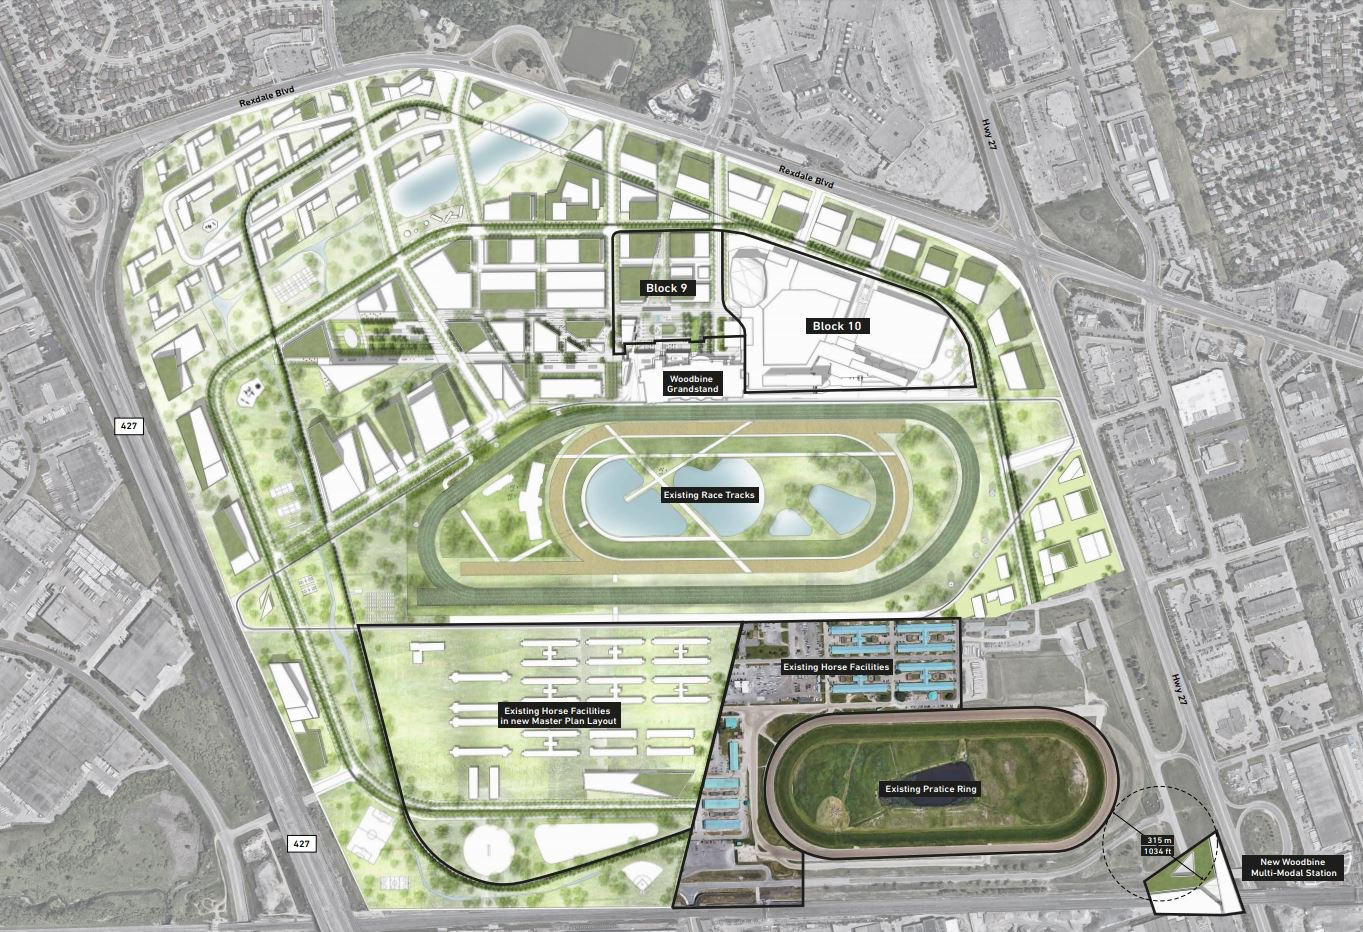 Woodbine Casino Map Woodbine Go Station Plan   Woodbine Racetrack